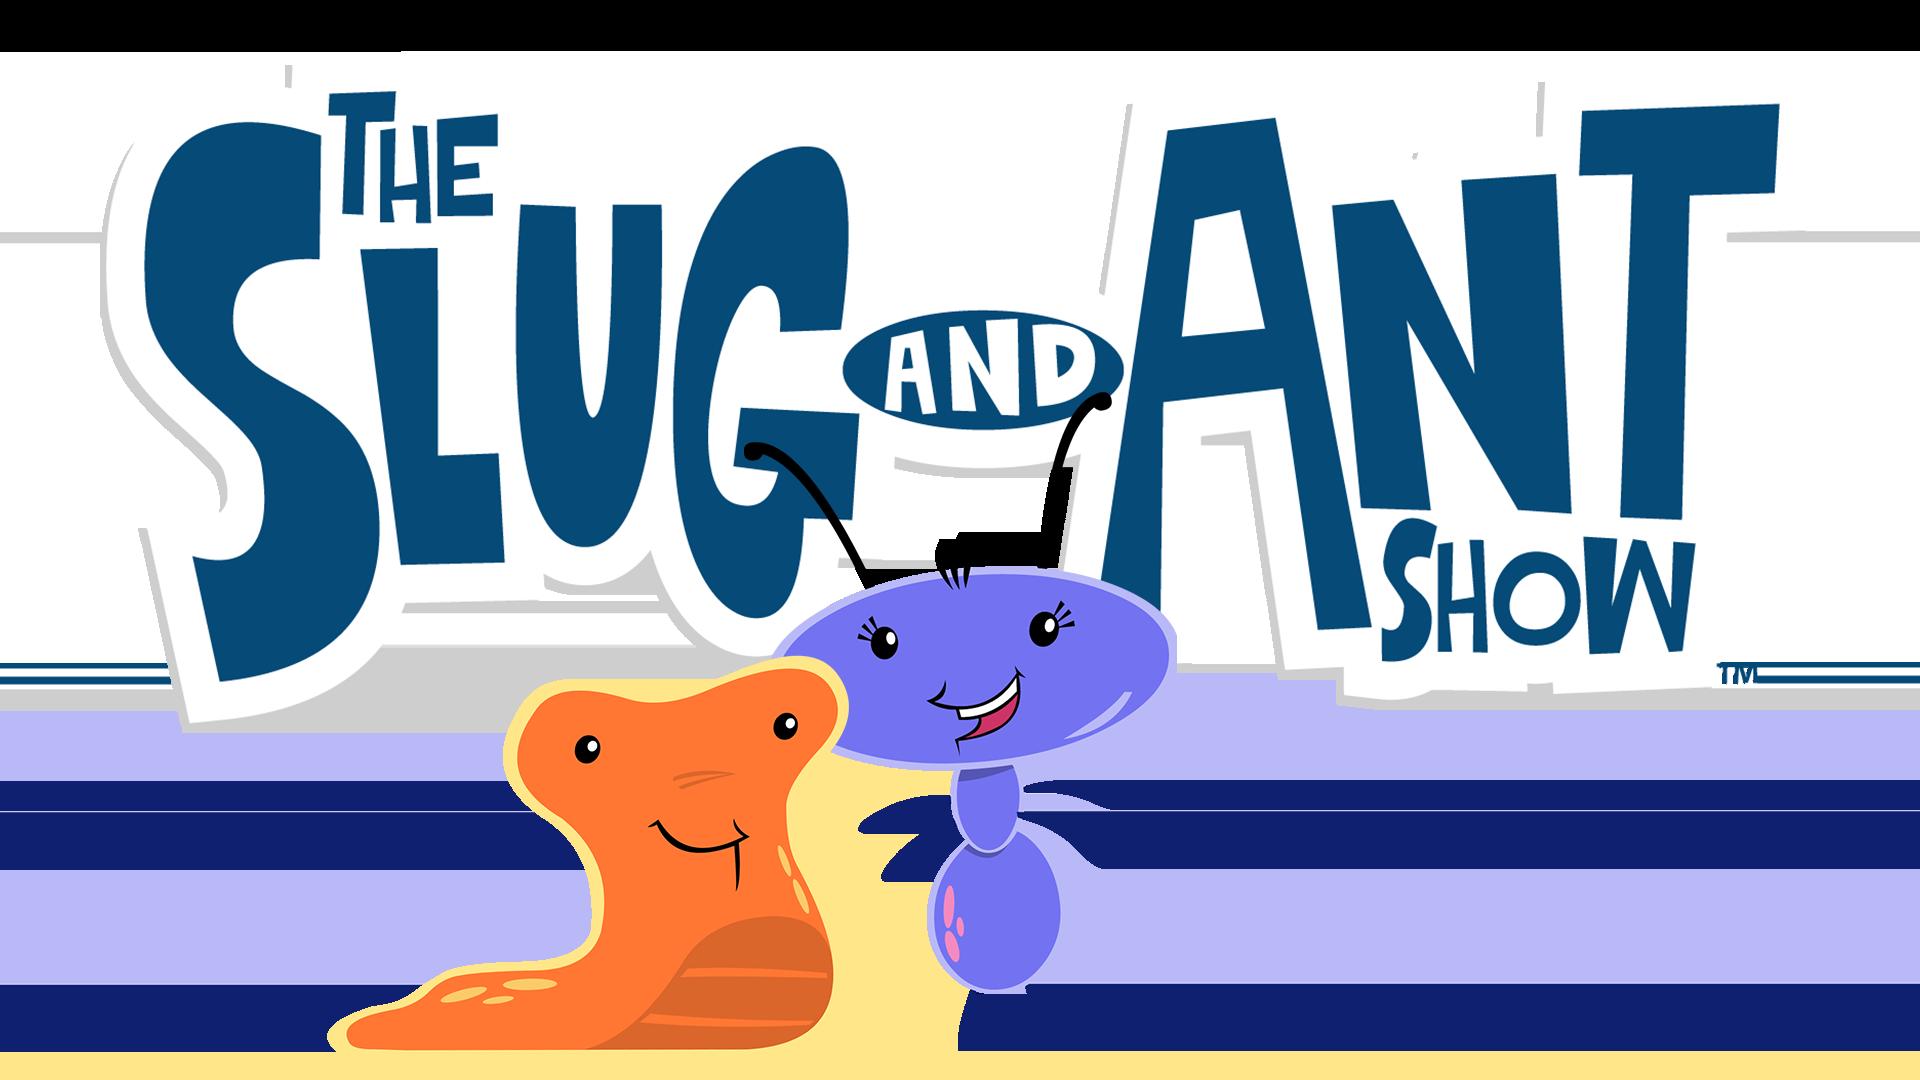 Slug ant show logo